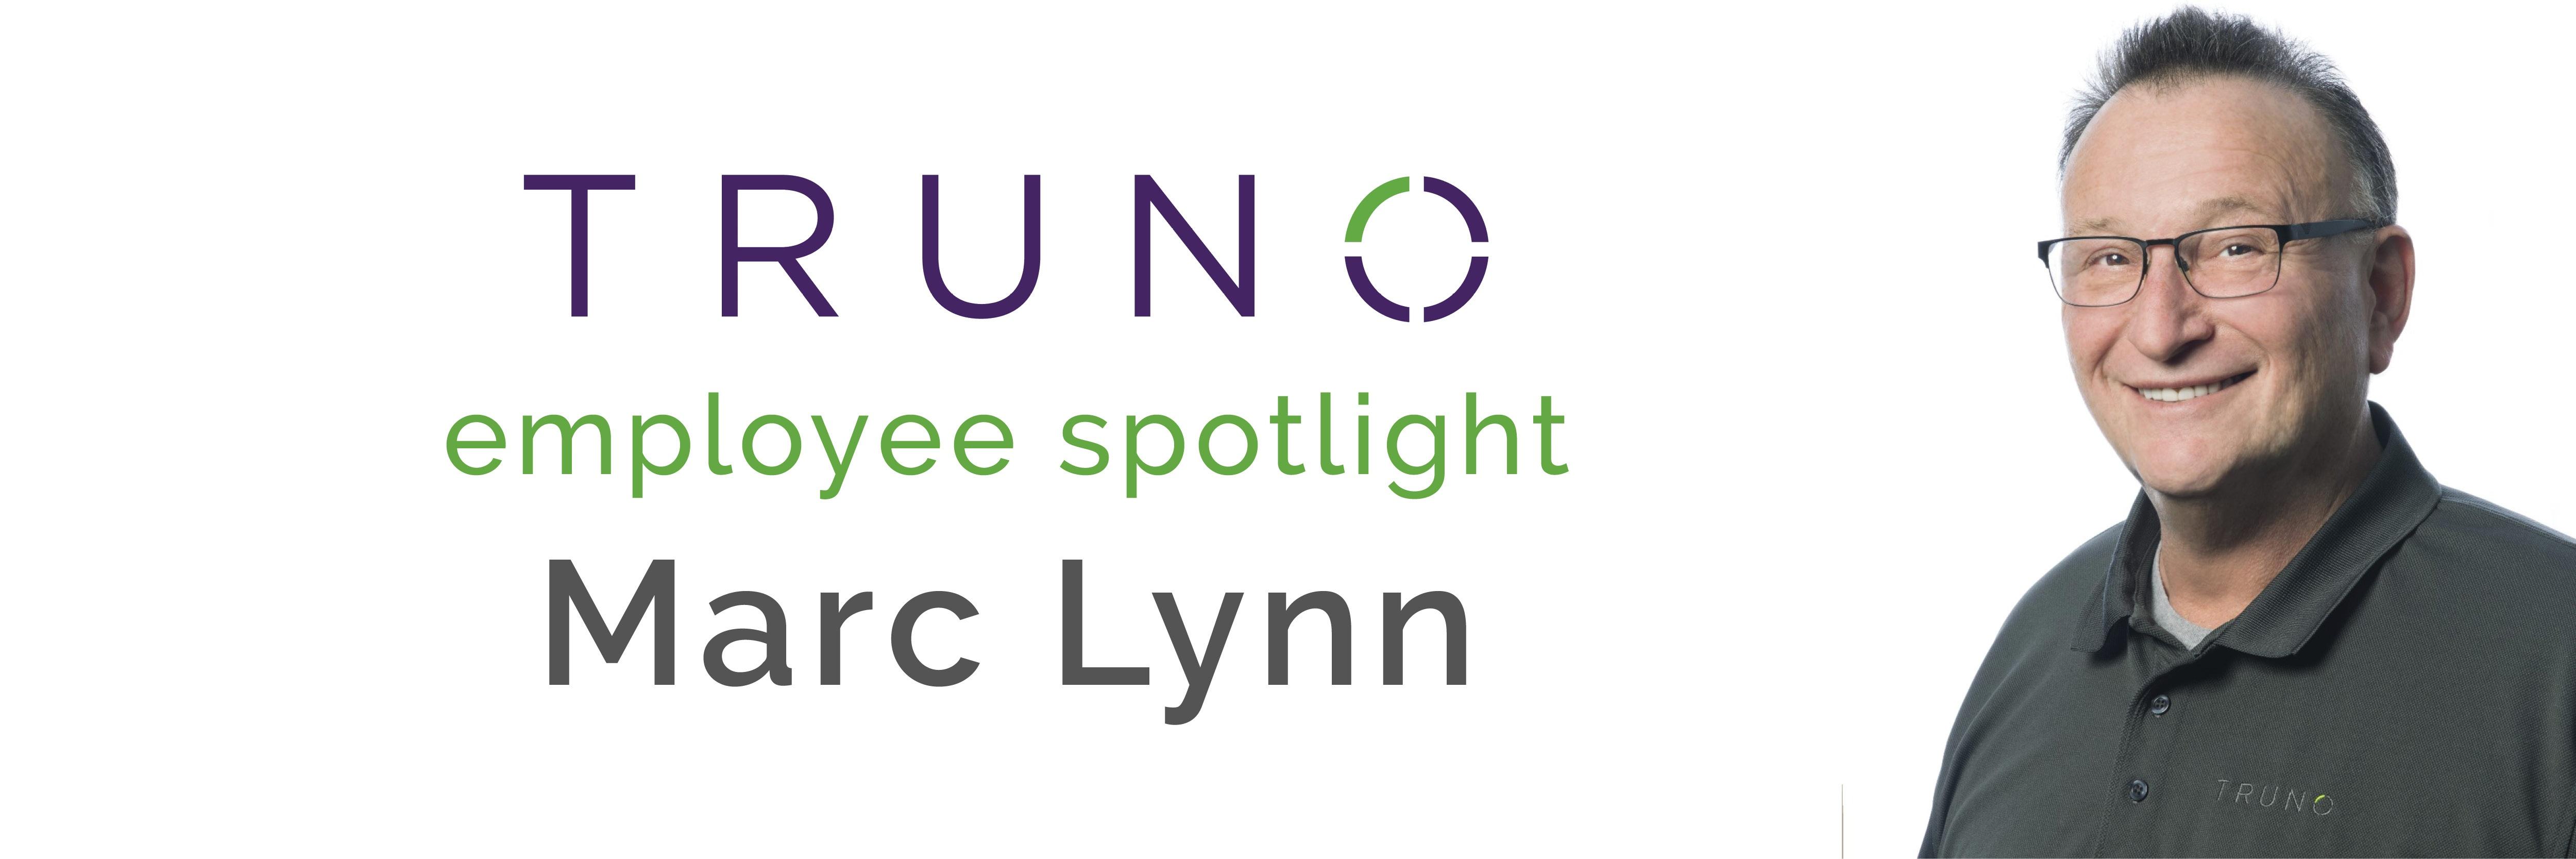 TRUNO Employee Spotlight: Marc Lynn